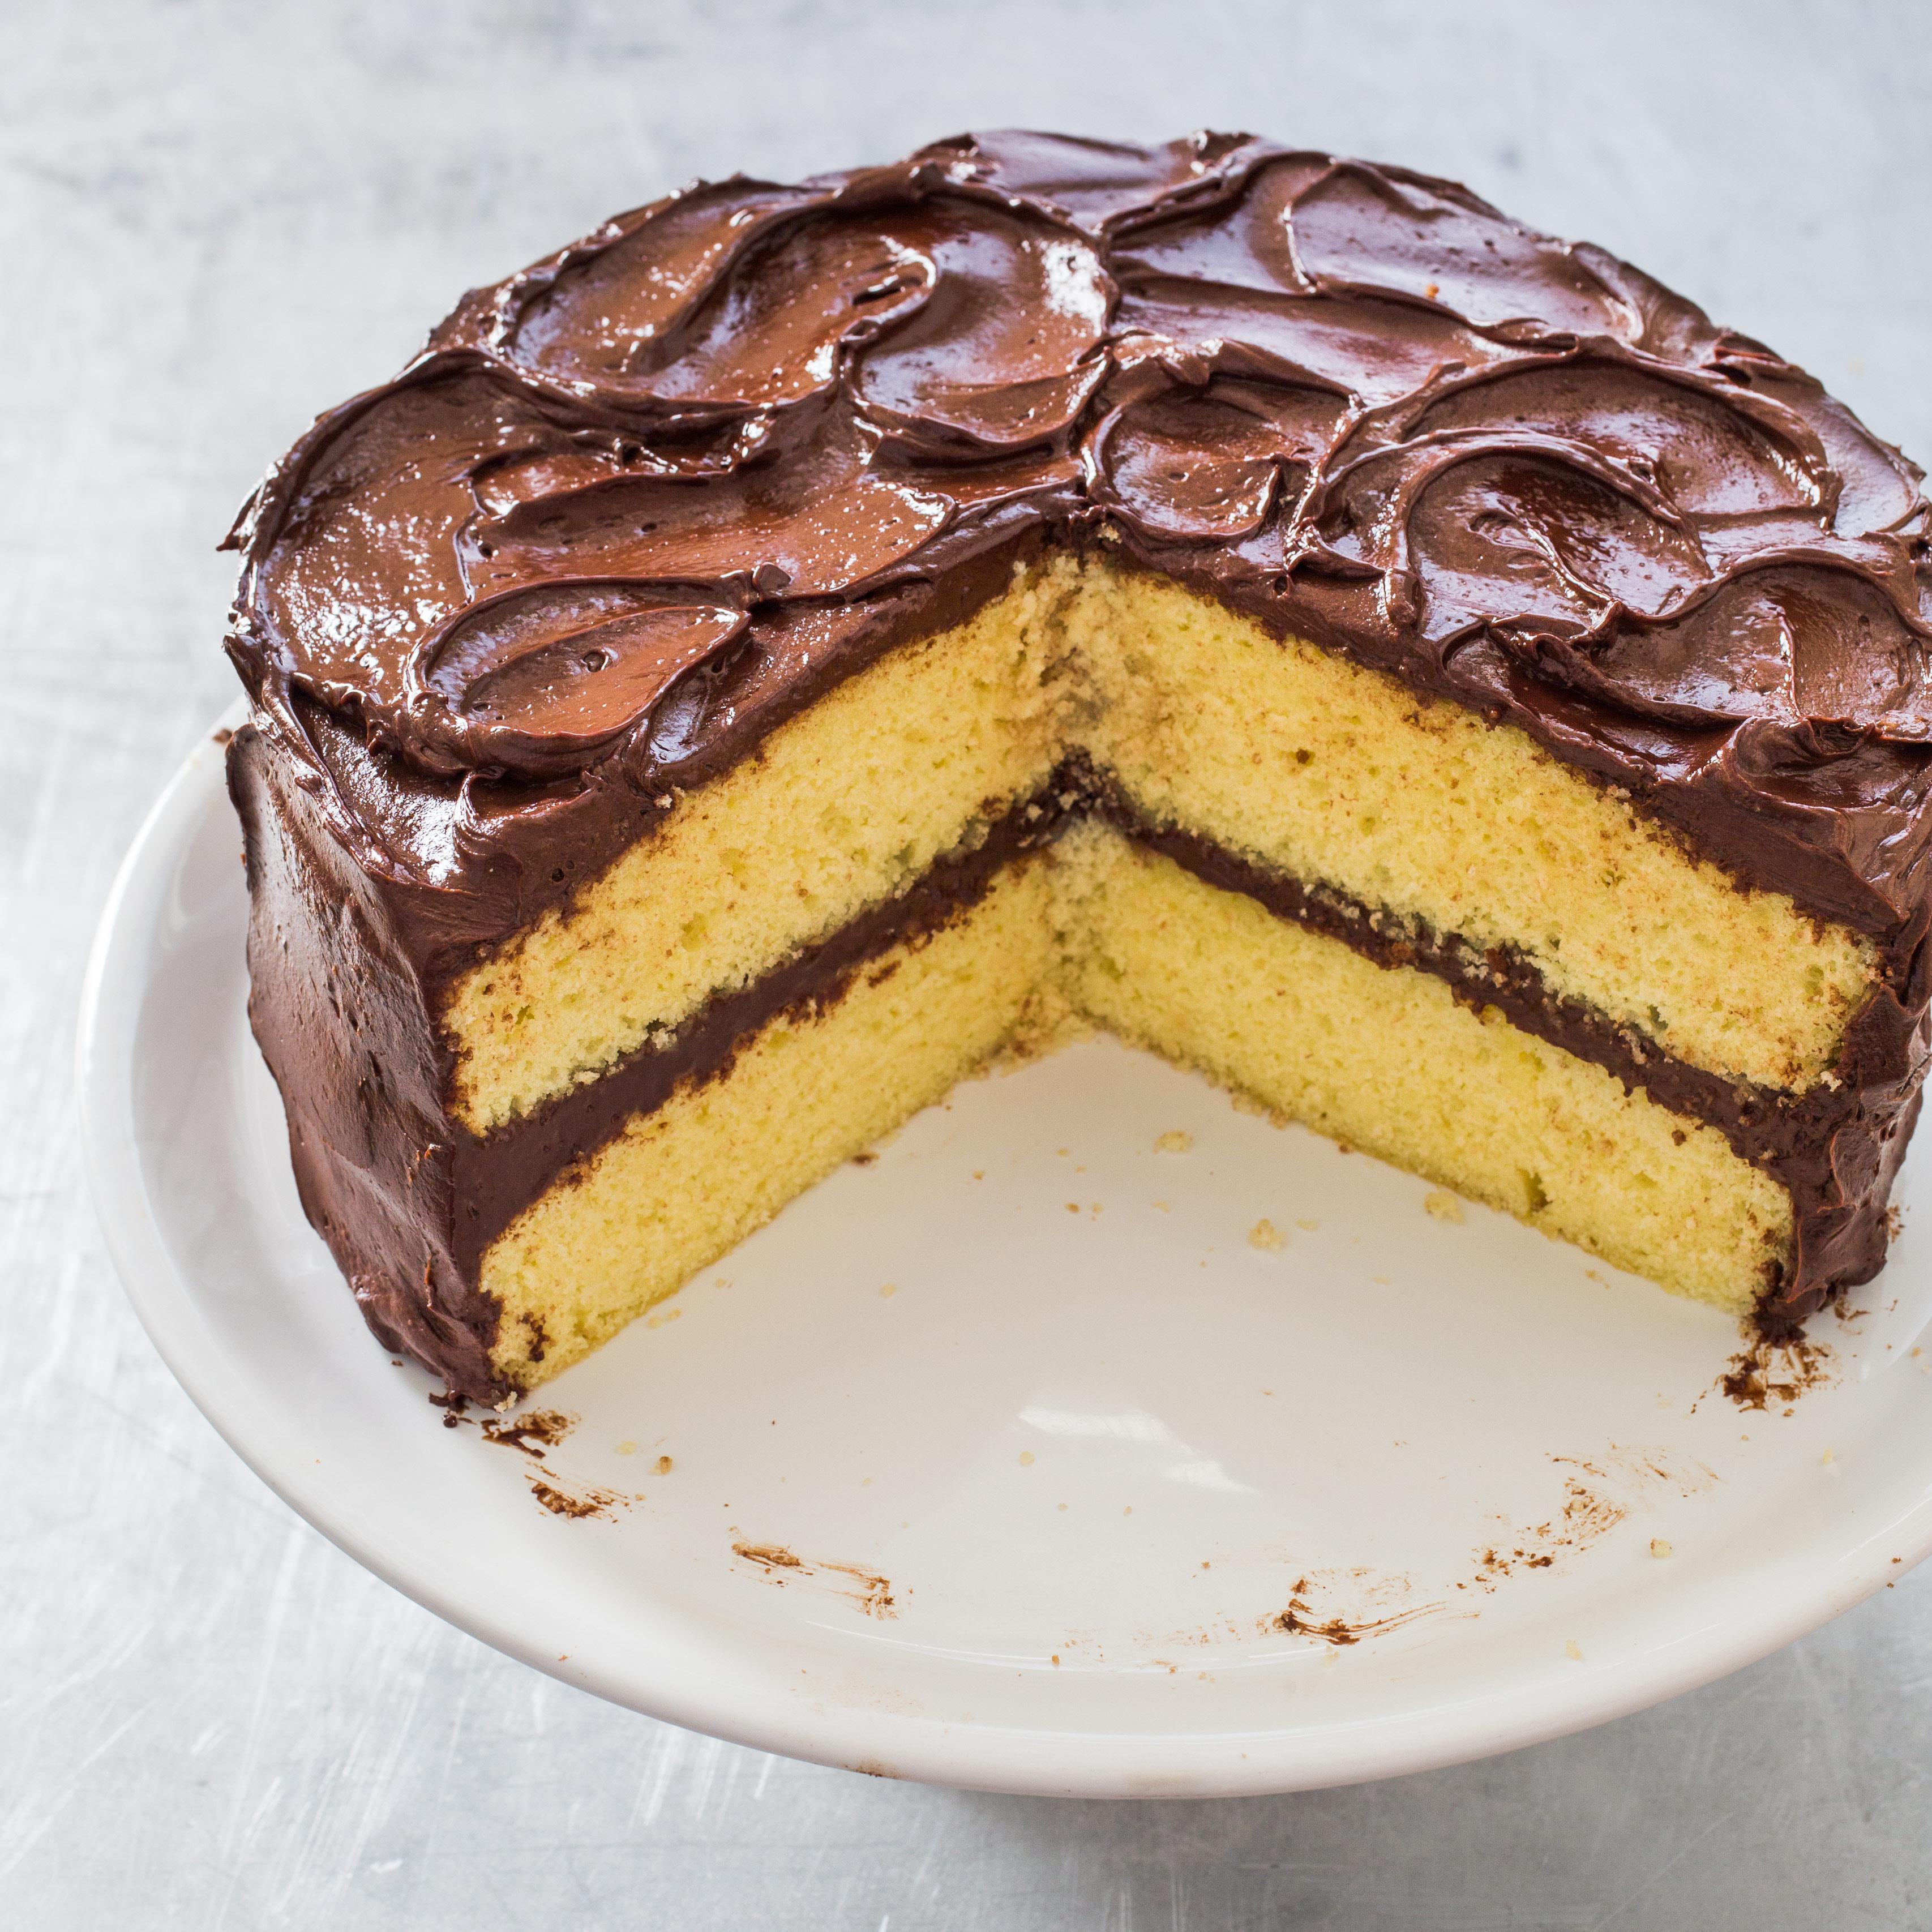 Recipe fluffy yellow layer cake